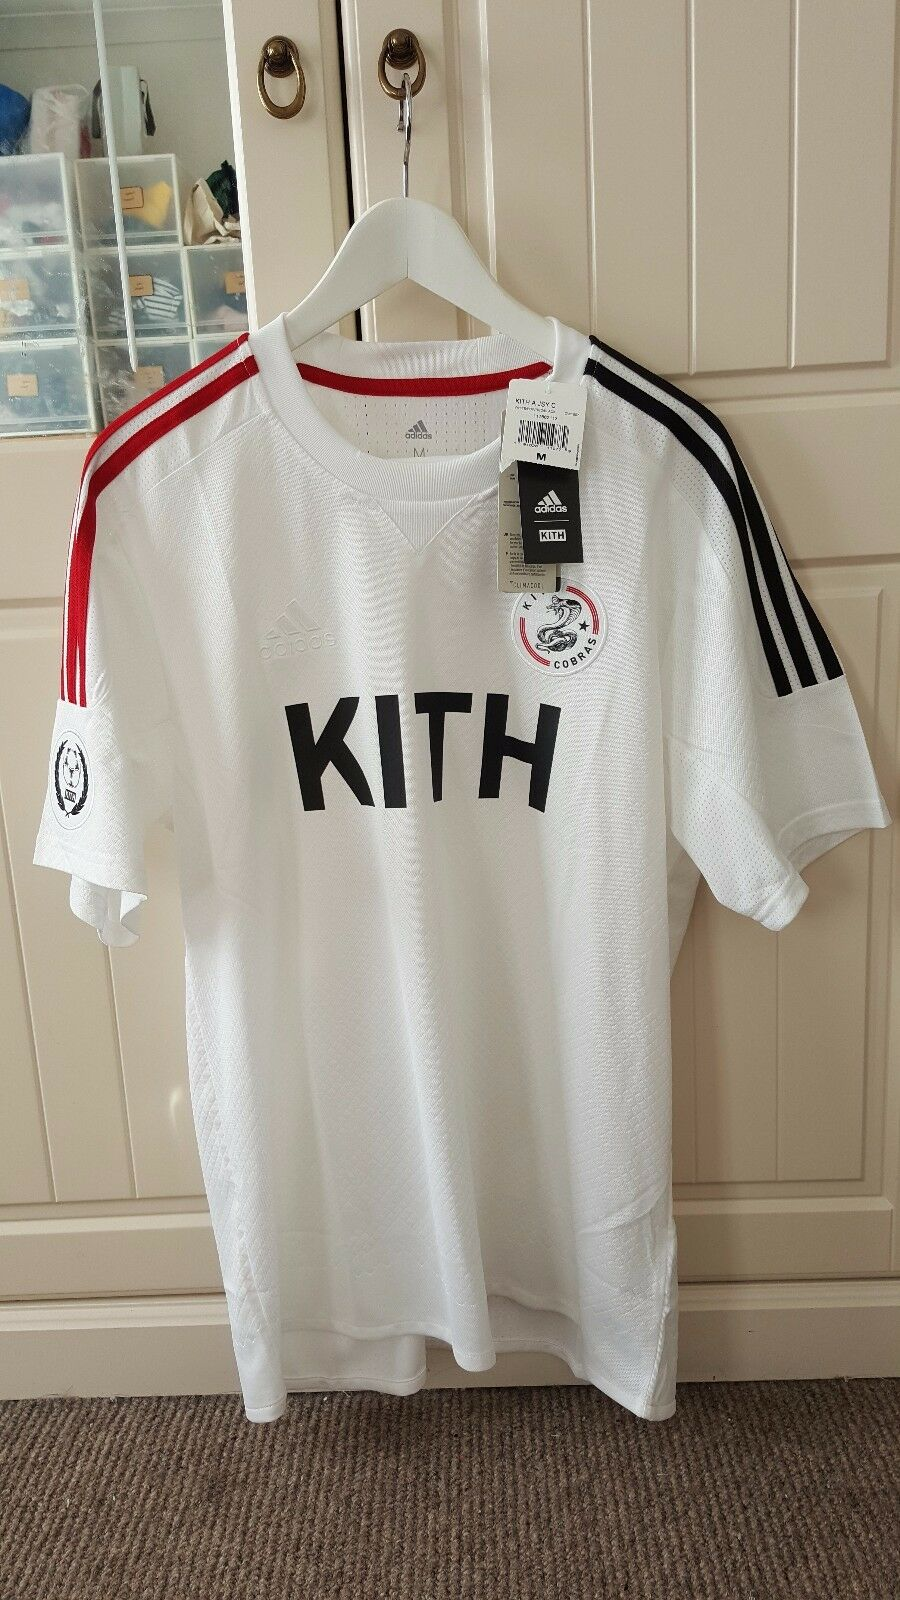 07e2d1fd2 Kith X adidas Cobras Home Soccer Football Jersey for sale online | eBay